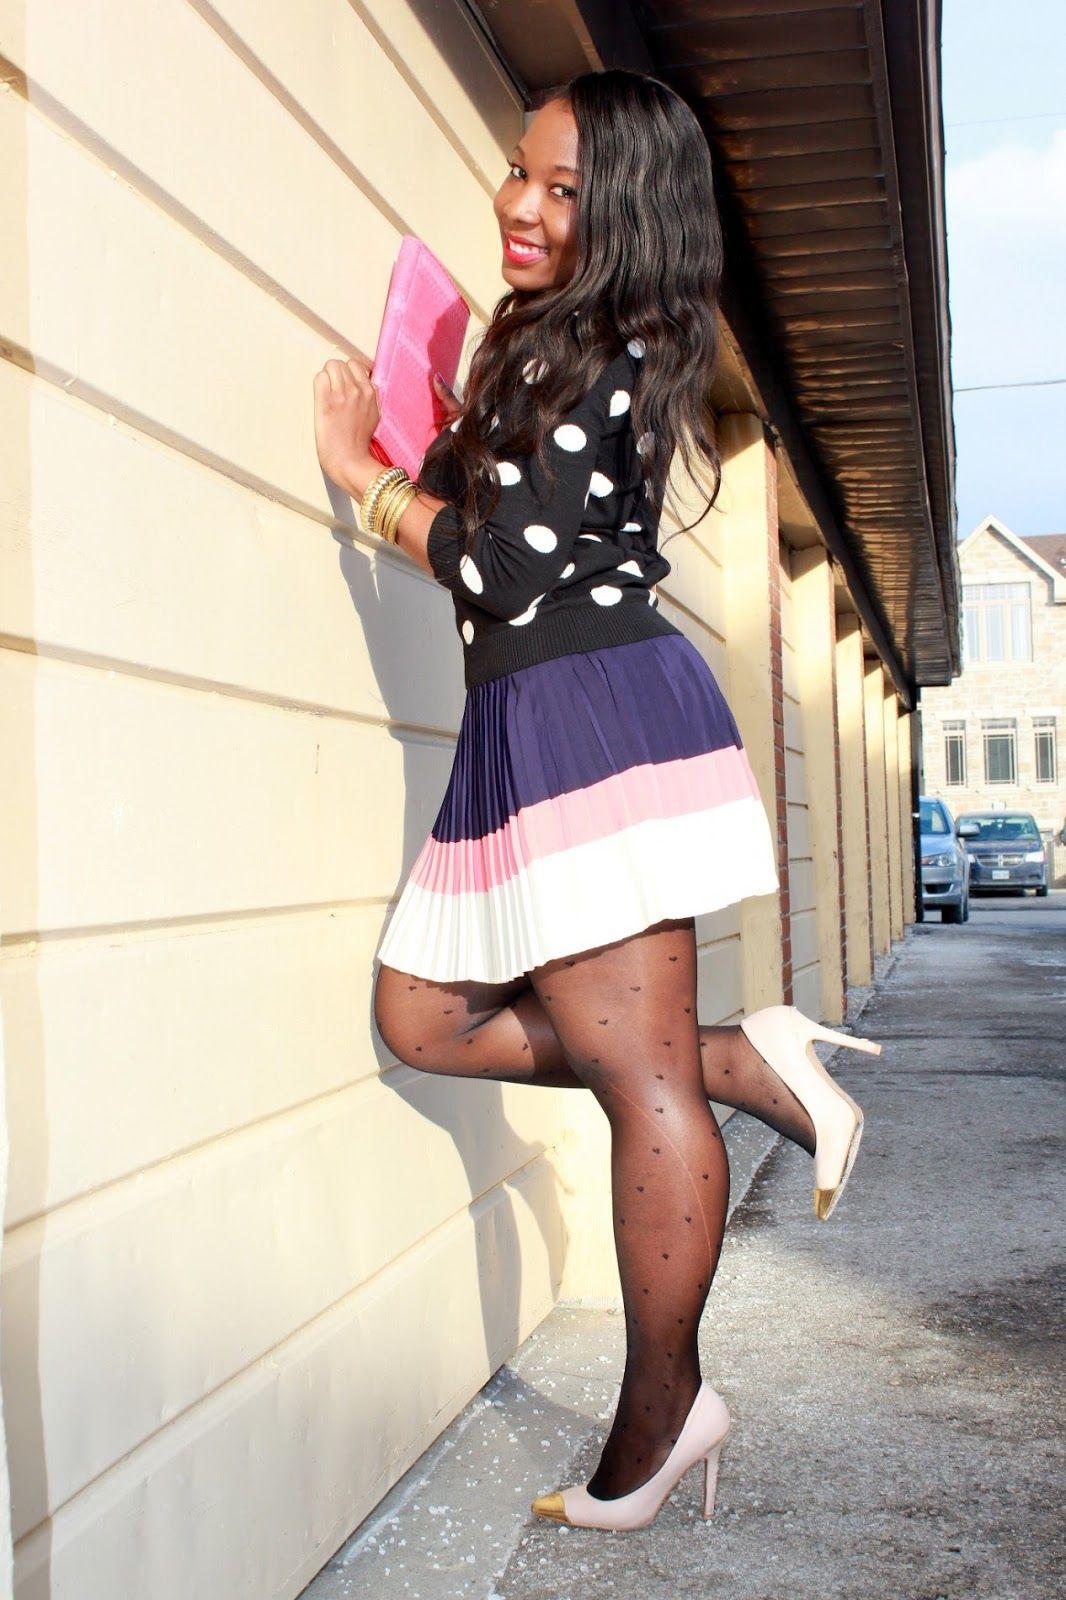 Beautiful Pantyhose On Women Interest Blogger Girls